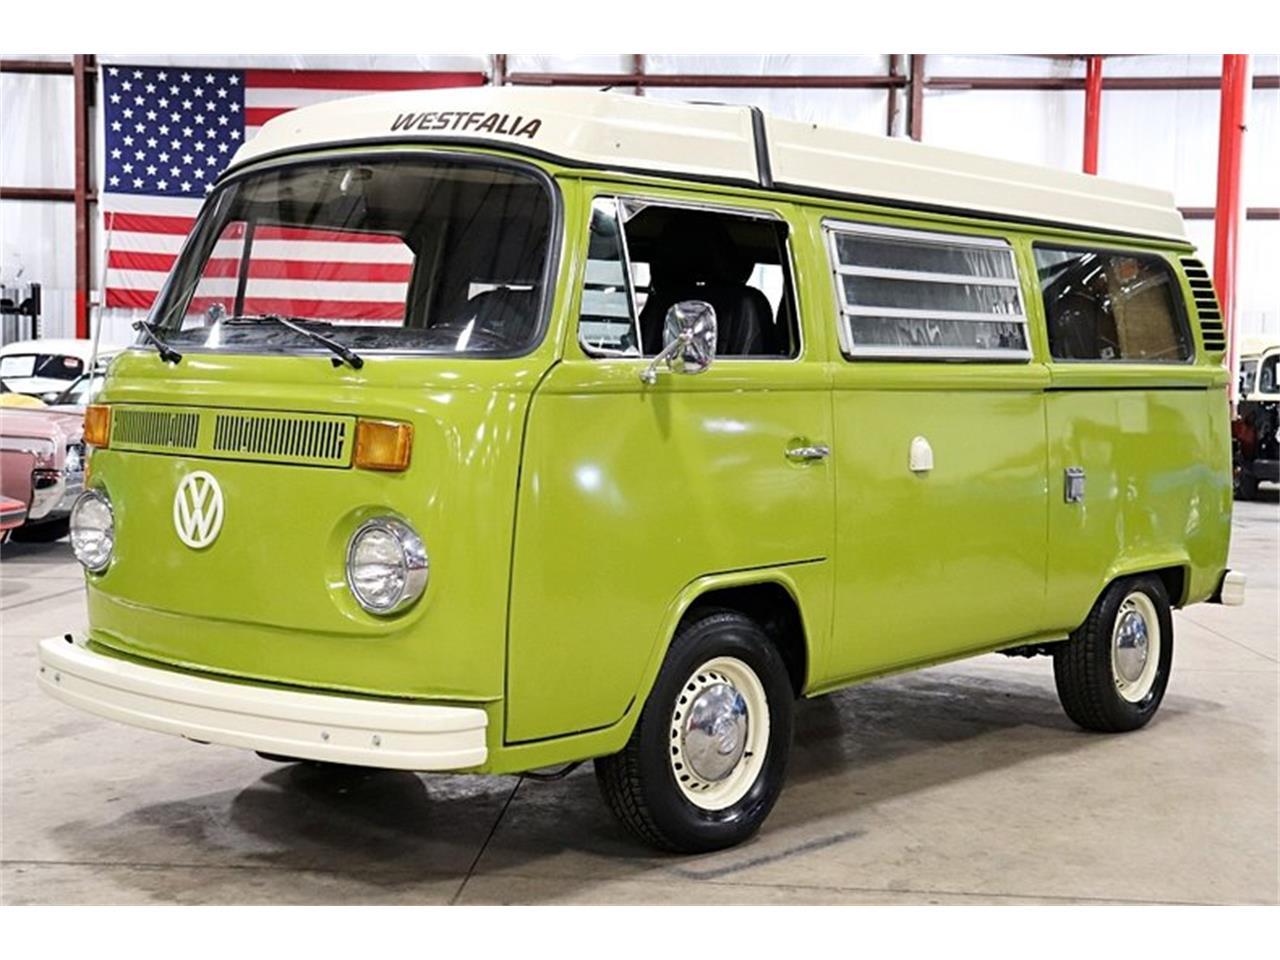 1978 Volkswagen Westfalia Camper For Sale In Kentwood Mi Classiccarsbay Com